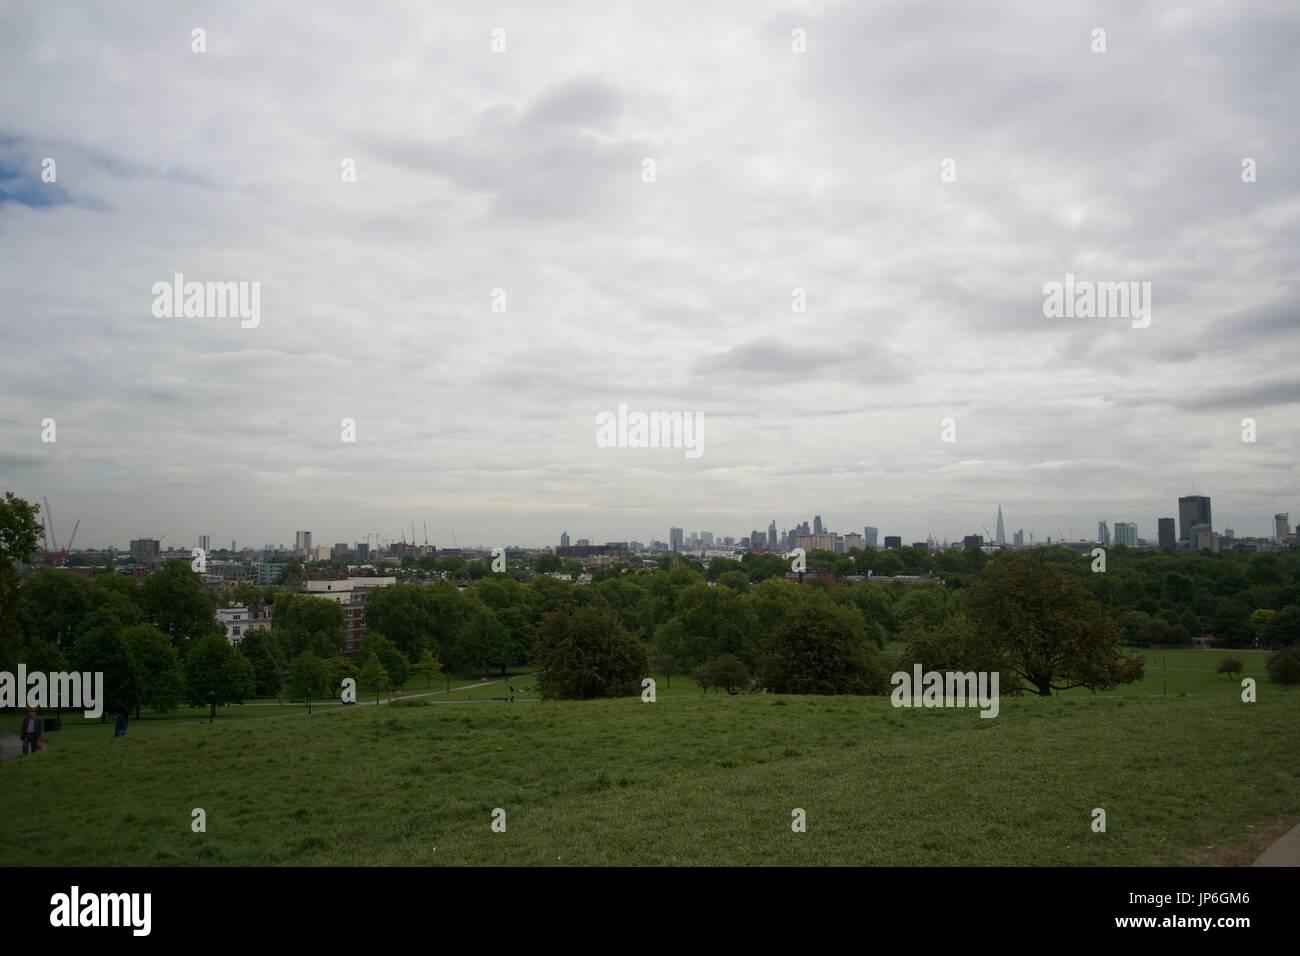 London Parks - Primrose Hill - UK Stock Photo